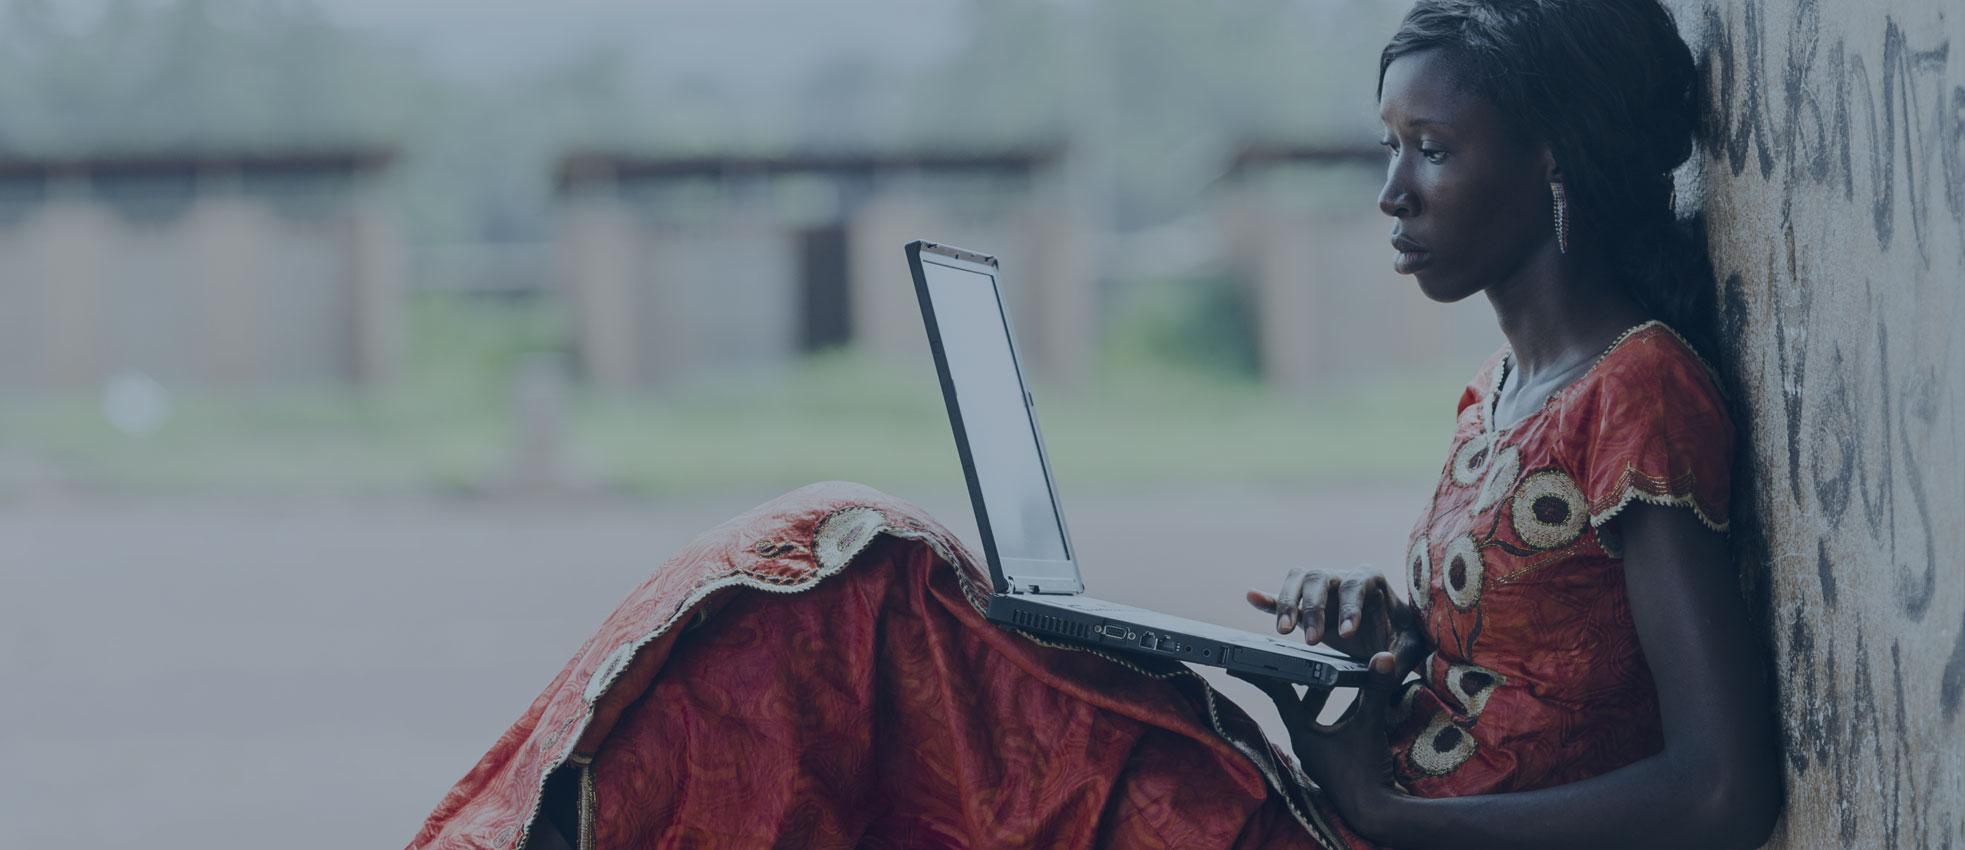 African Internet user